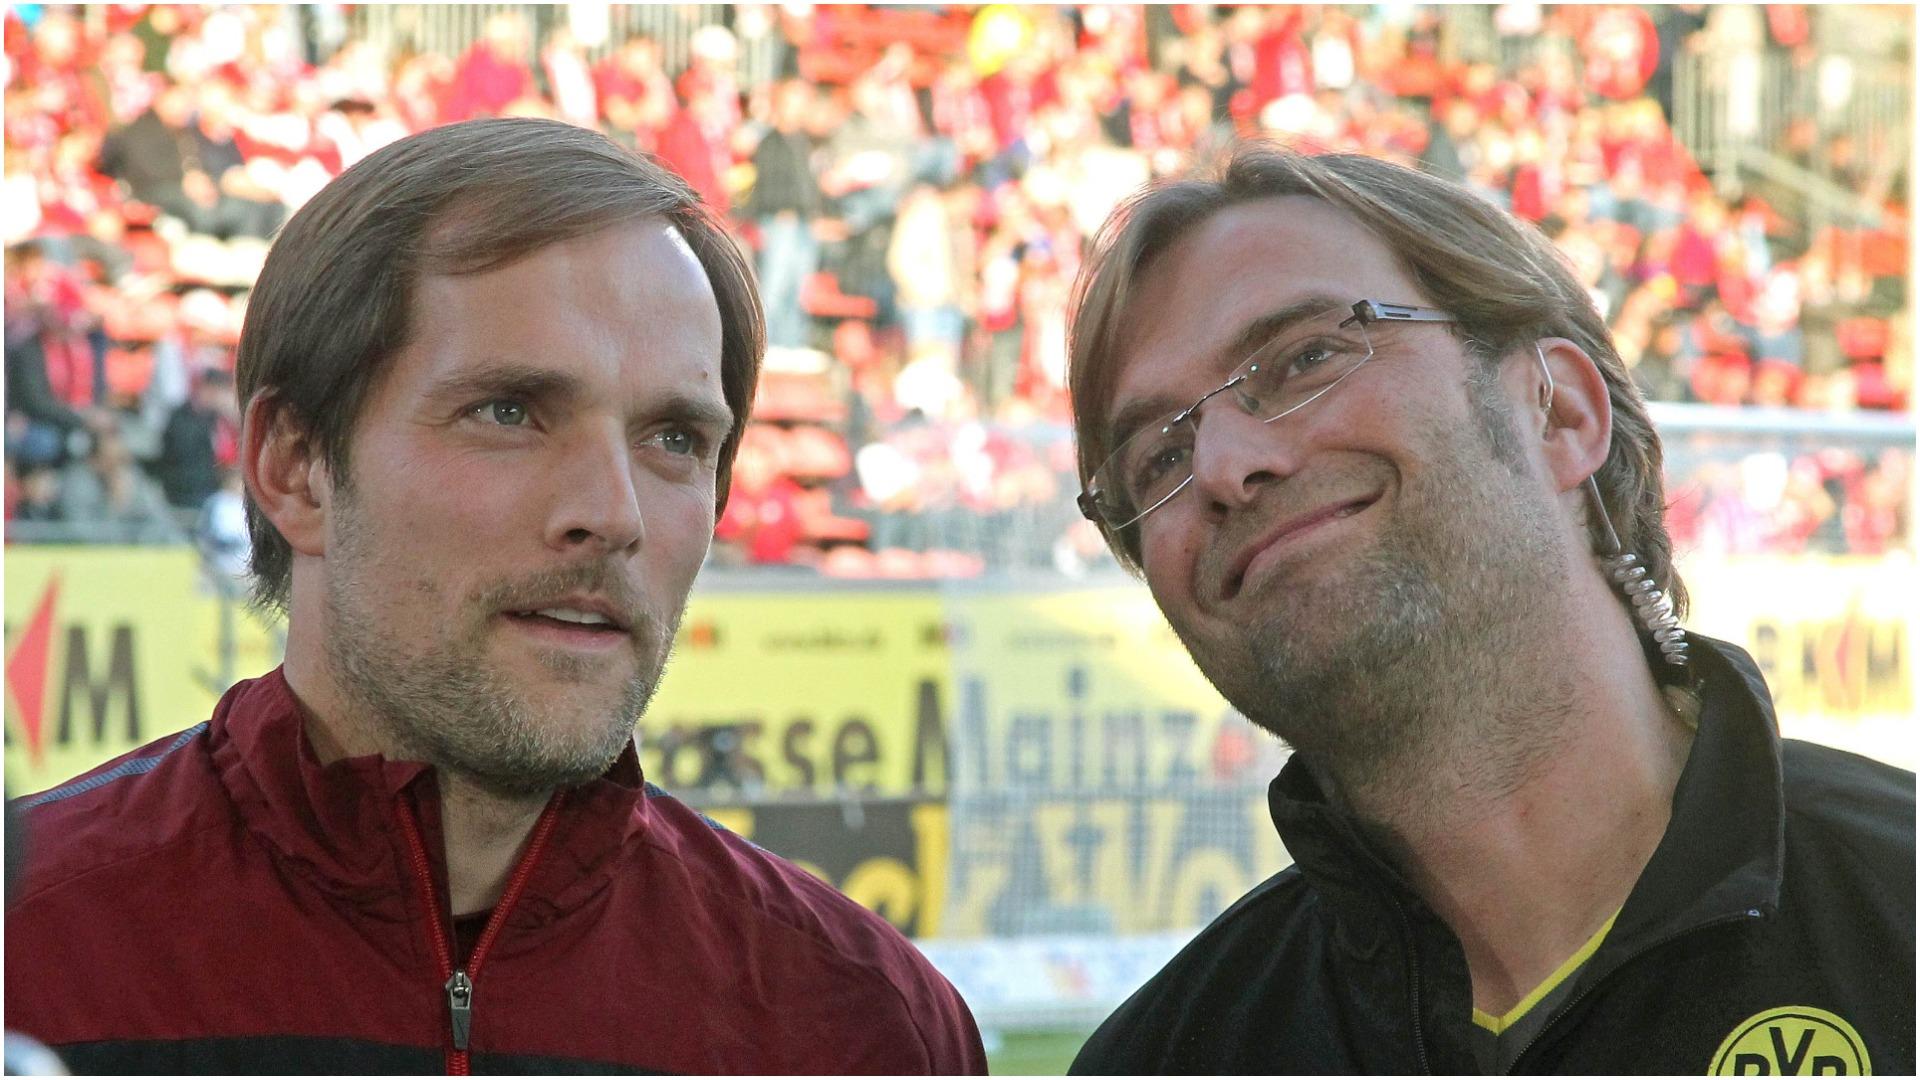 Liverpool v Chelsea: Klopp and Tuchel take familiar paths to Premier League showdown